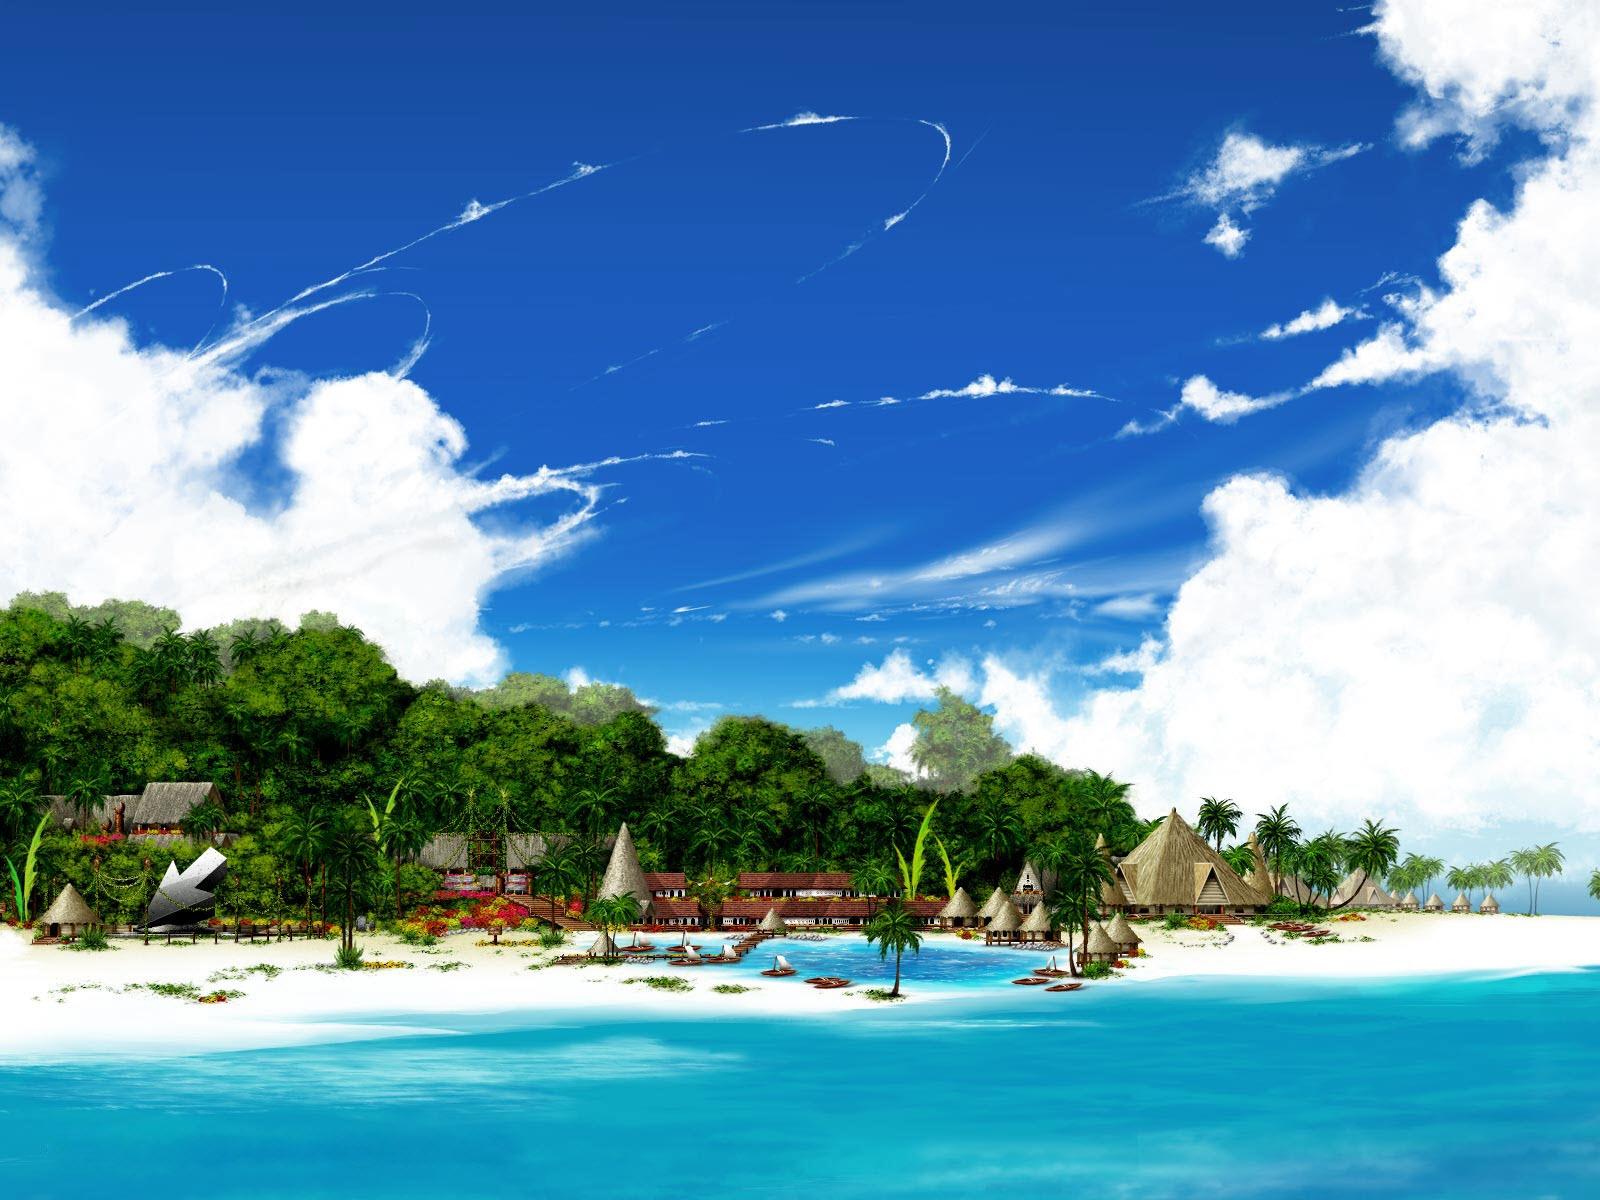 Beautiful Beach Pictures HD Desktop Wallpaper HD Desktop Wallpaper 1600x1200